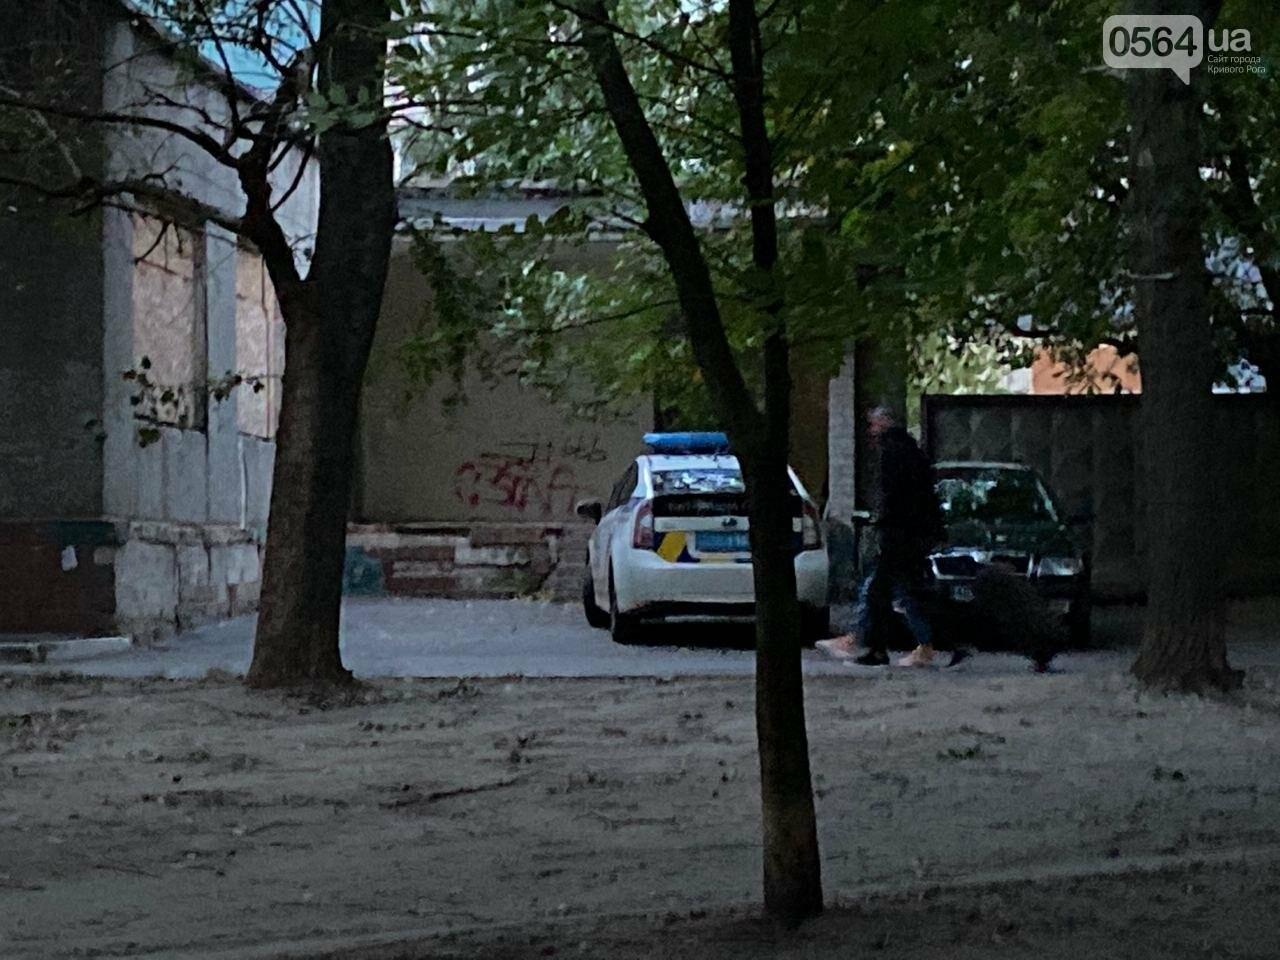 В Кривом Роге погиб мужчина, упавший с 5 этажа жилого дома, - ФОТО 18+, фото-8